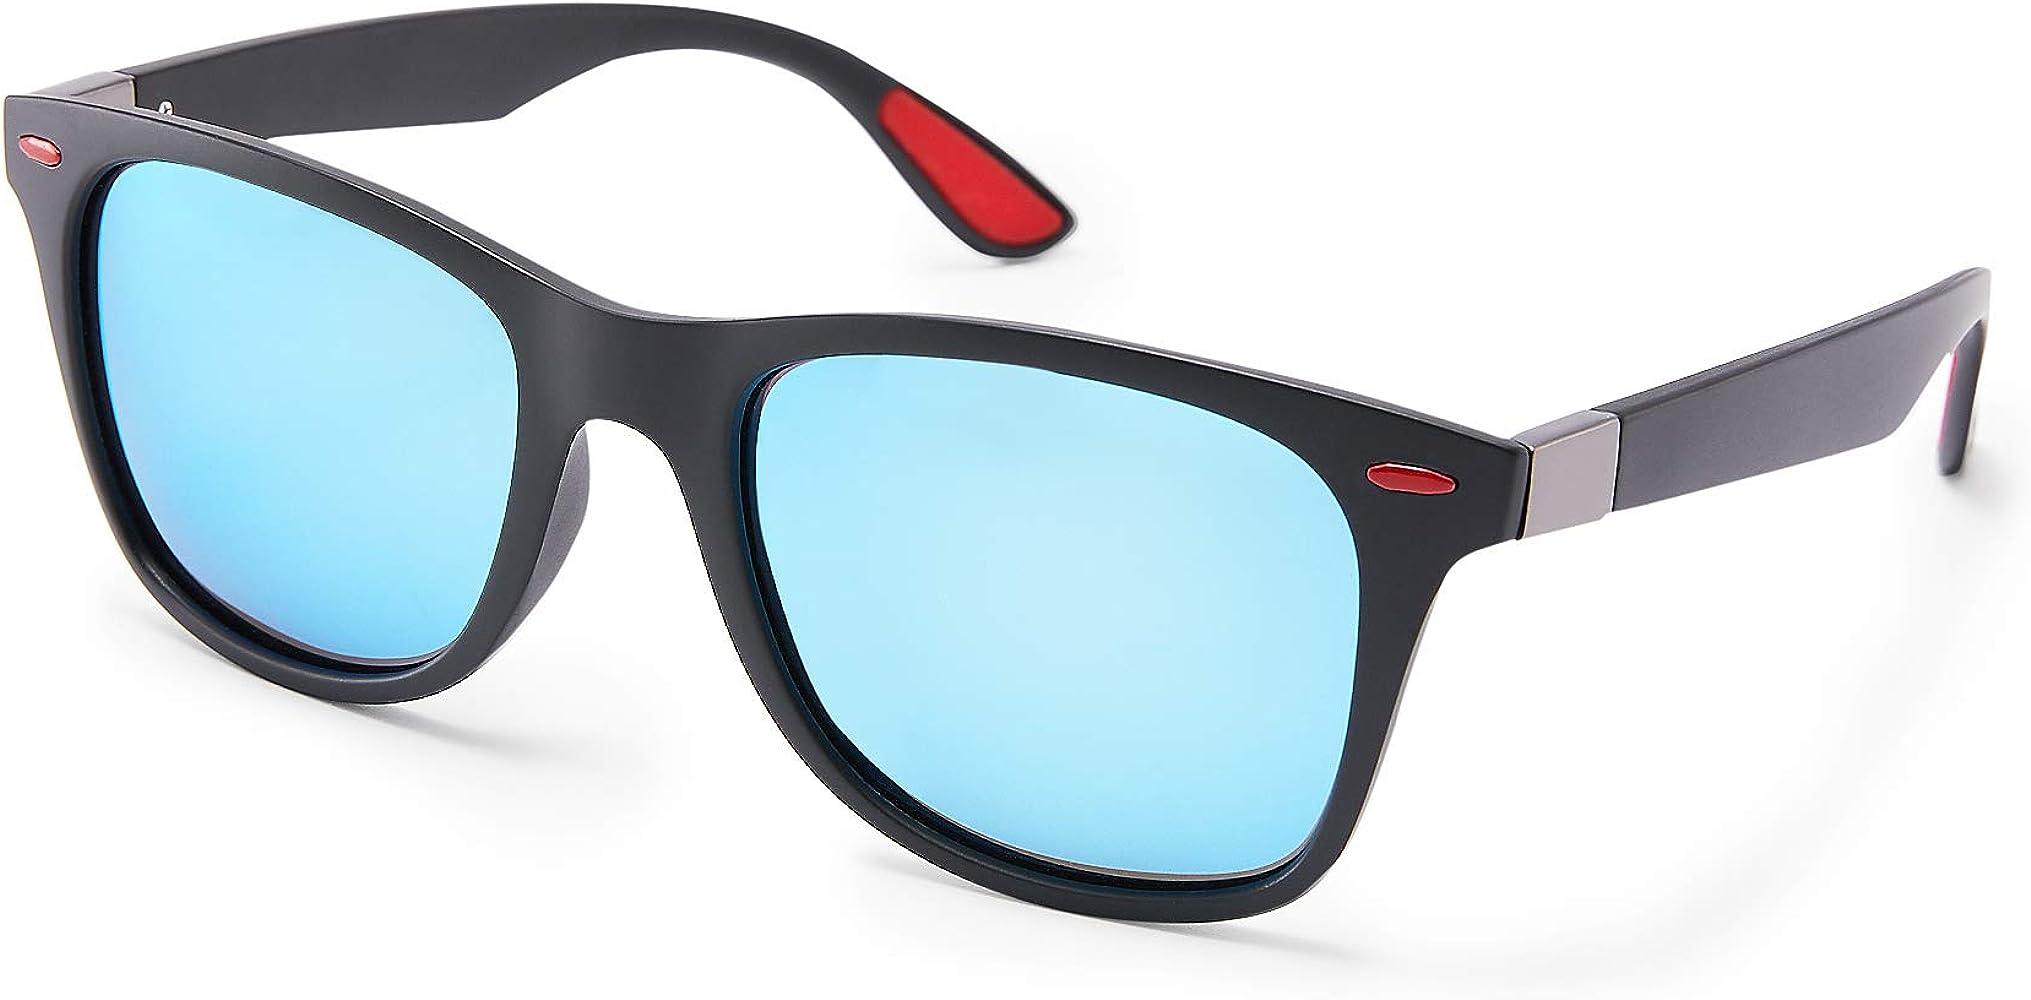 DOVAVA Gafas de sol Hombre Polarizado Protección UV Conducir Gafas ...